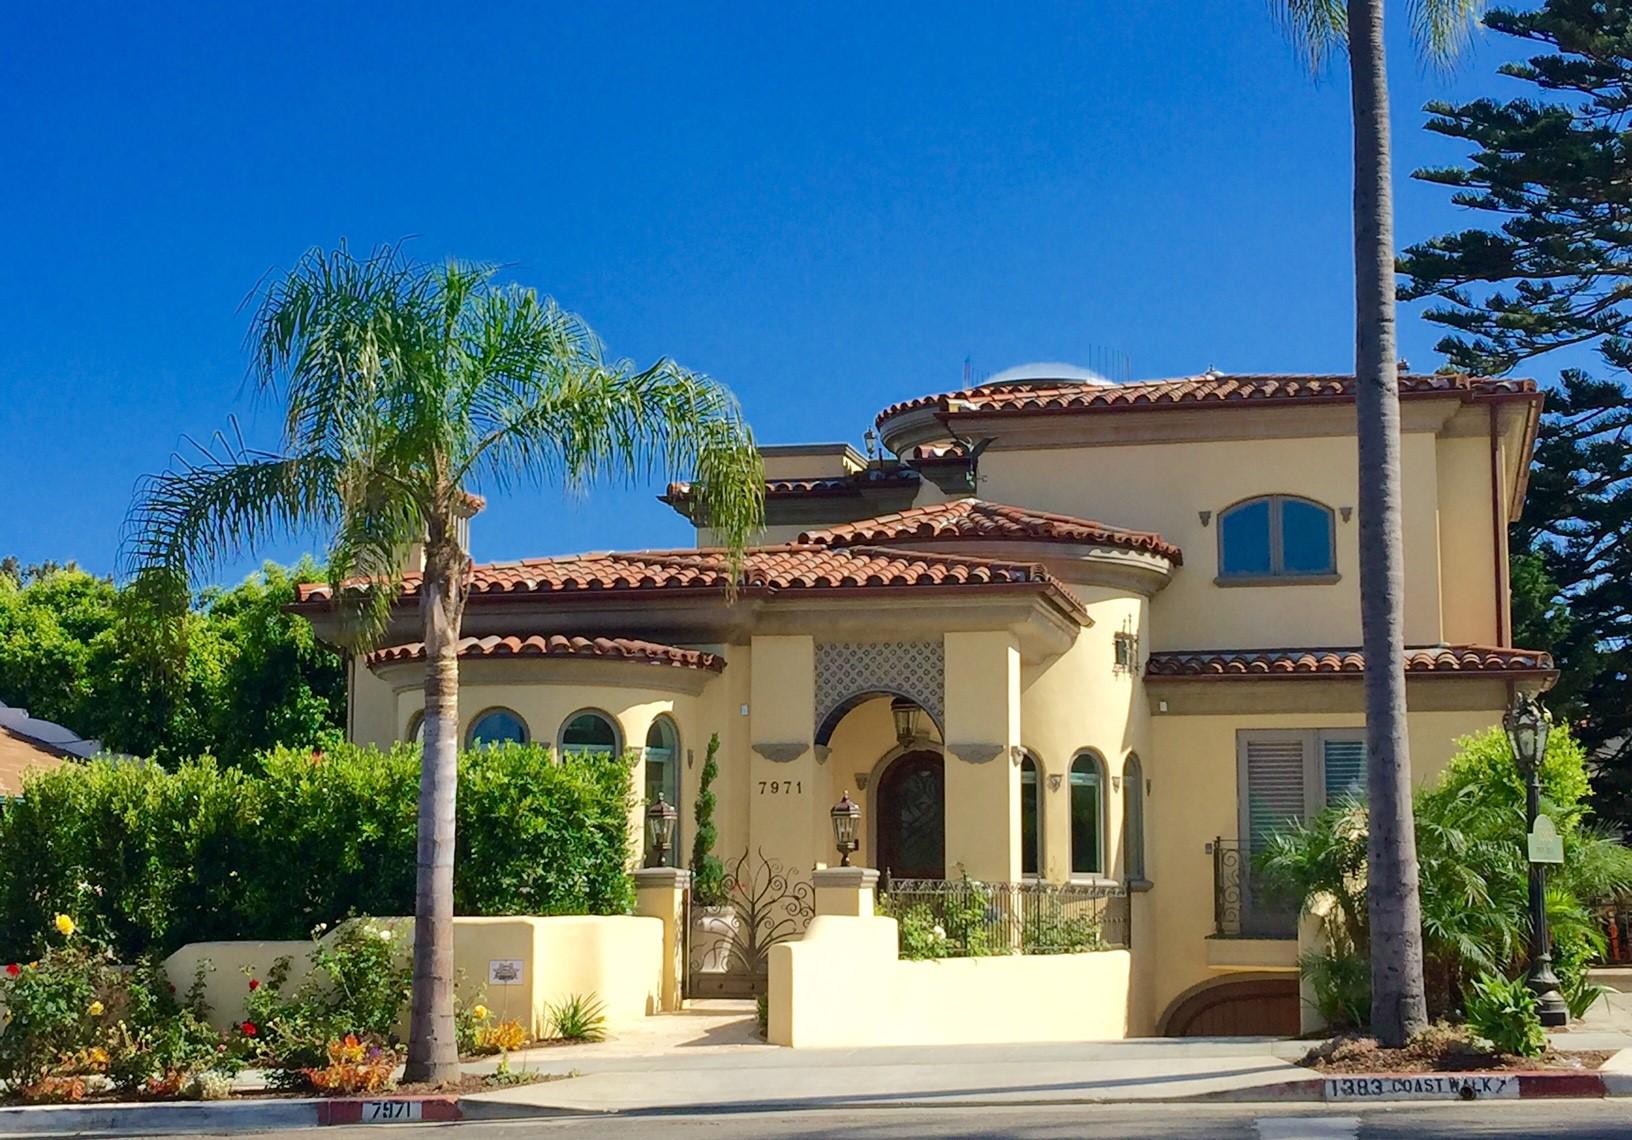 Moradia para Venda às 7971 Prospect Place La Jolla, Califórnia, 92037 Estados Unidos